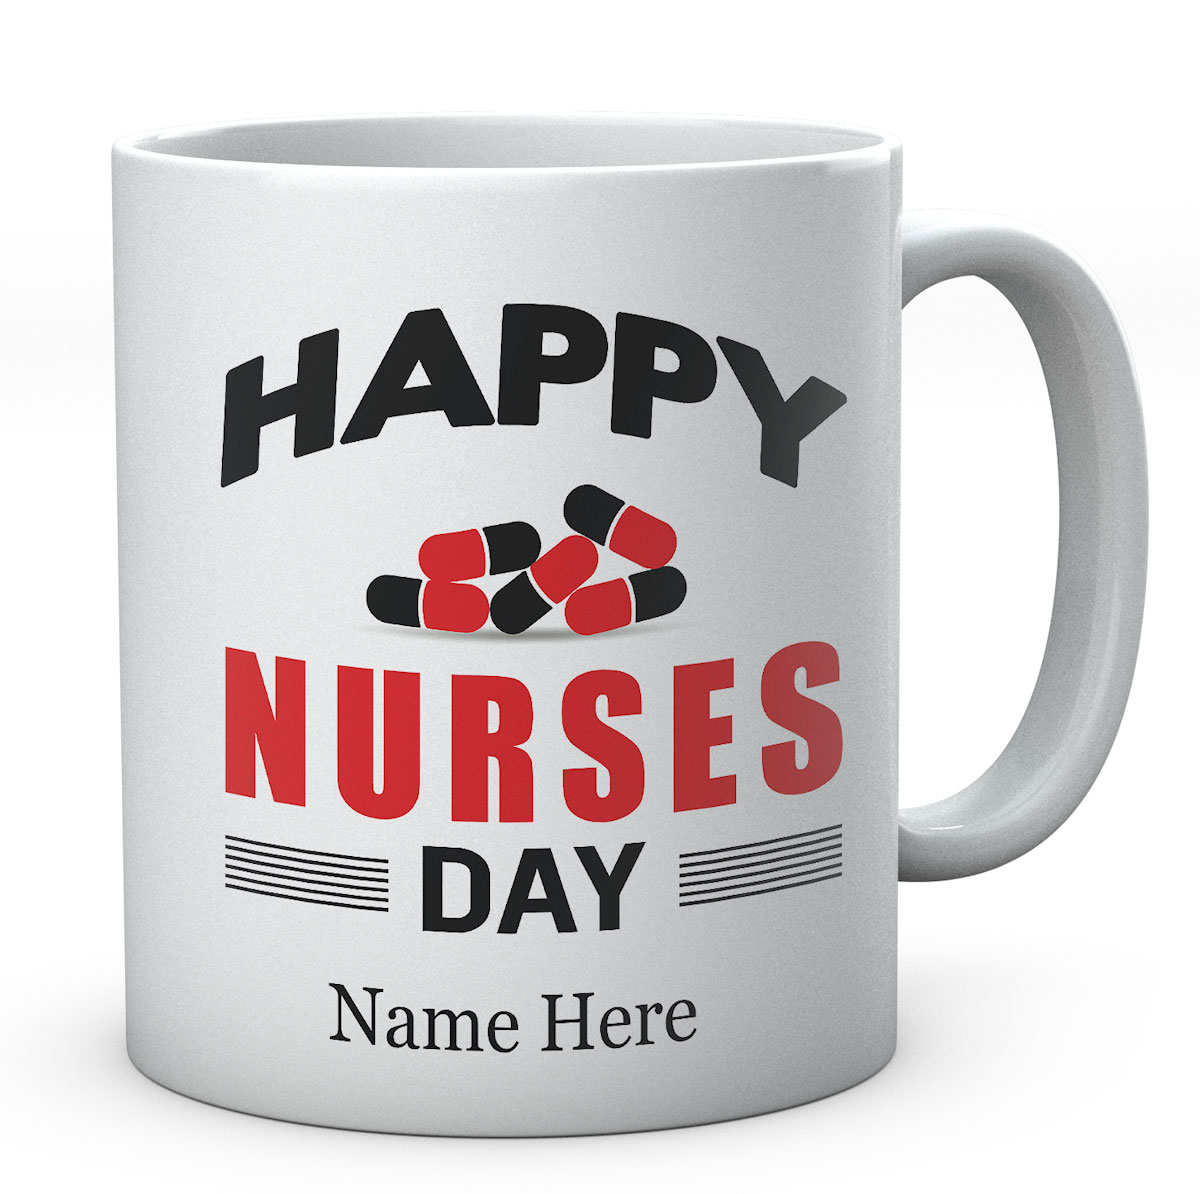 Personalised Happy Nurses Day Mug